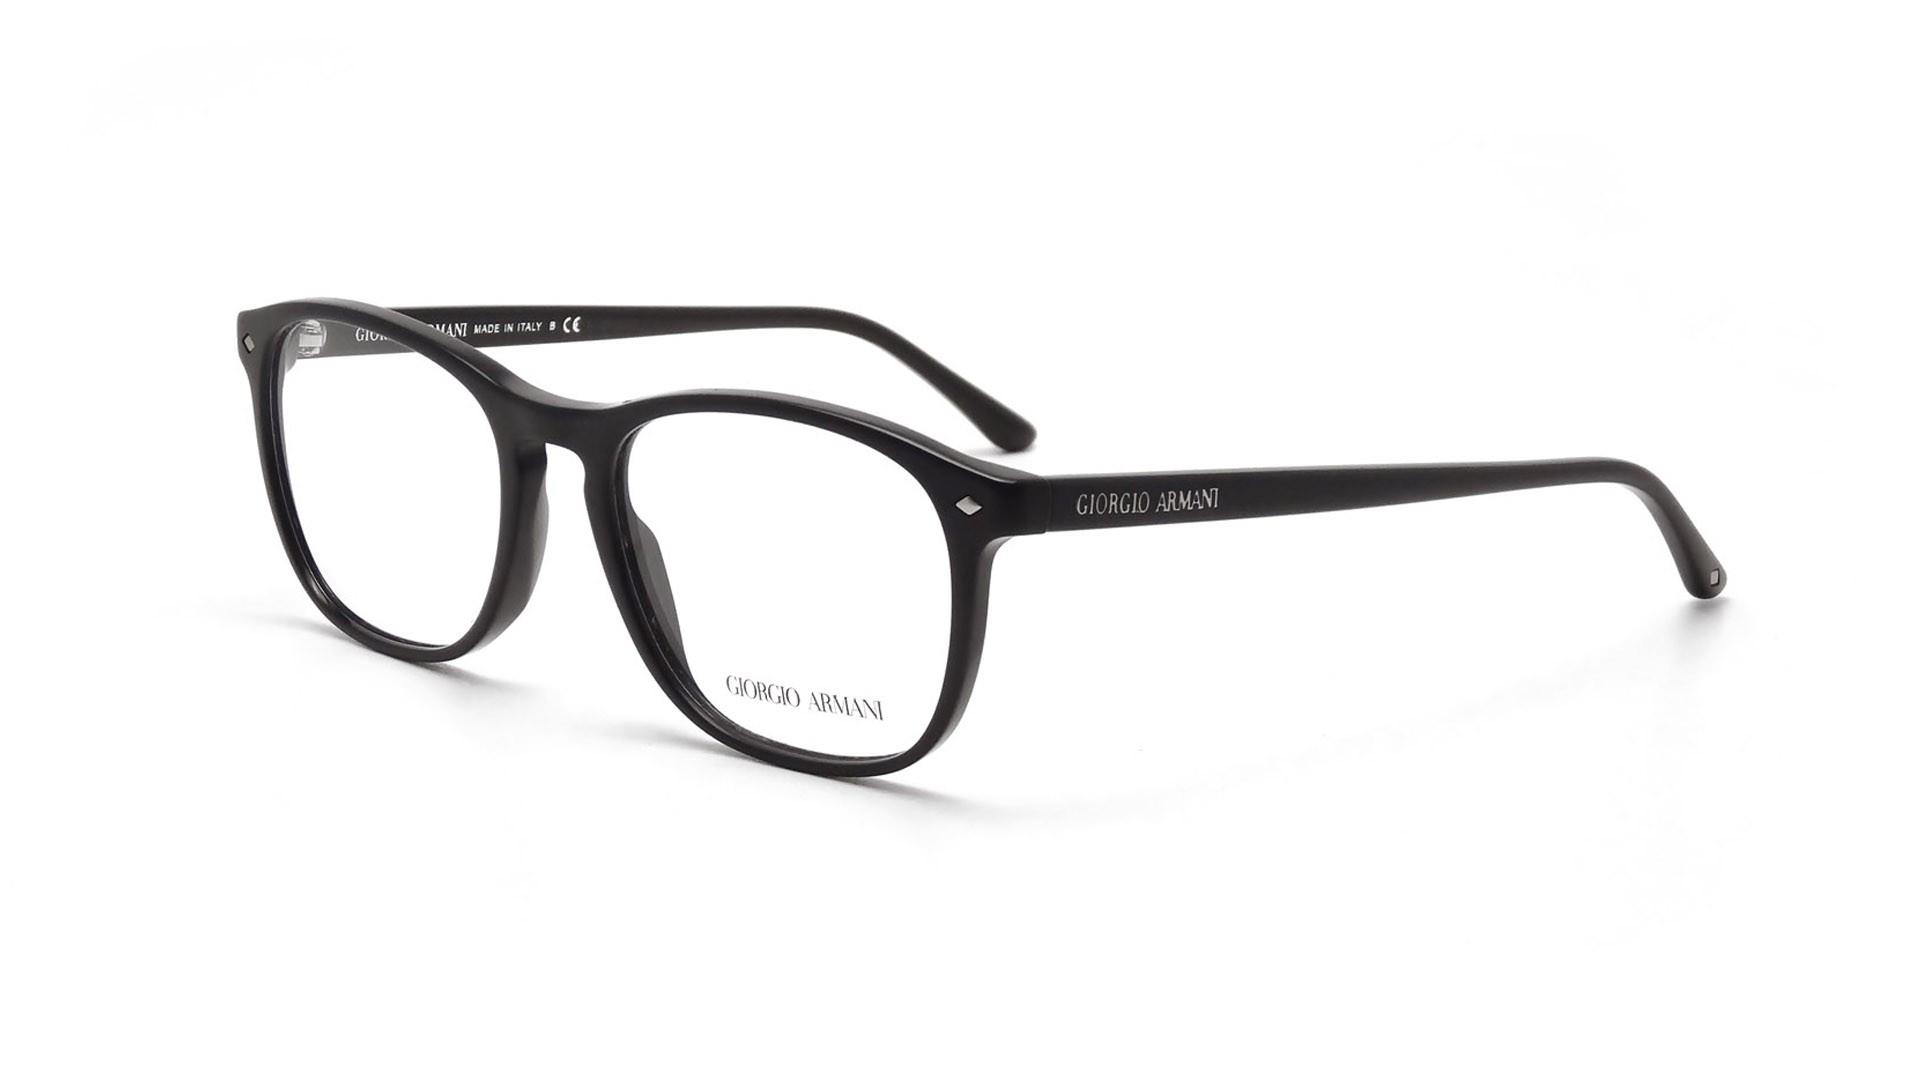 Giorgio Armani Glasses Black Frame : Giorgio Armani Frames of Life Black AR7003 5001 52-18 ...